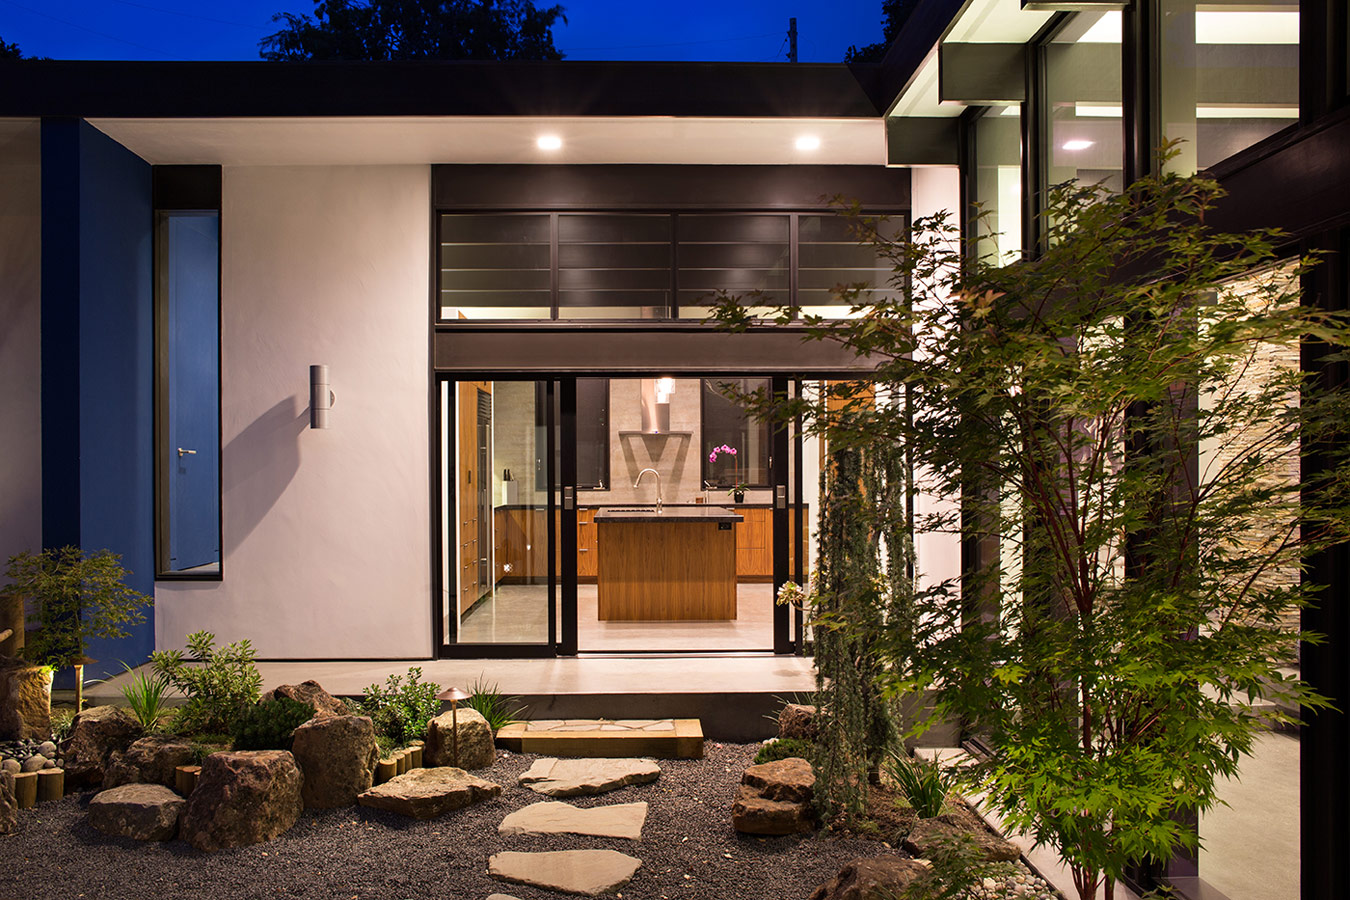 Modern Atrium House by Klopf Architecture